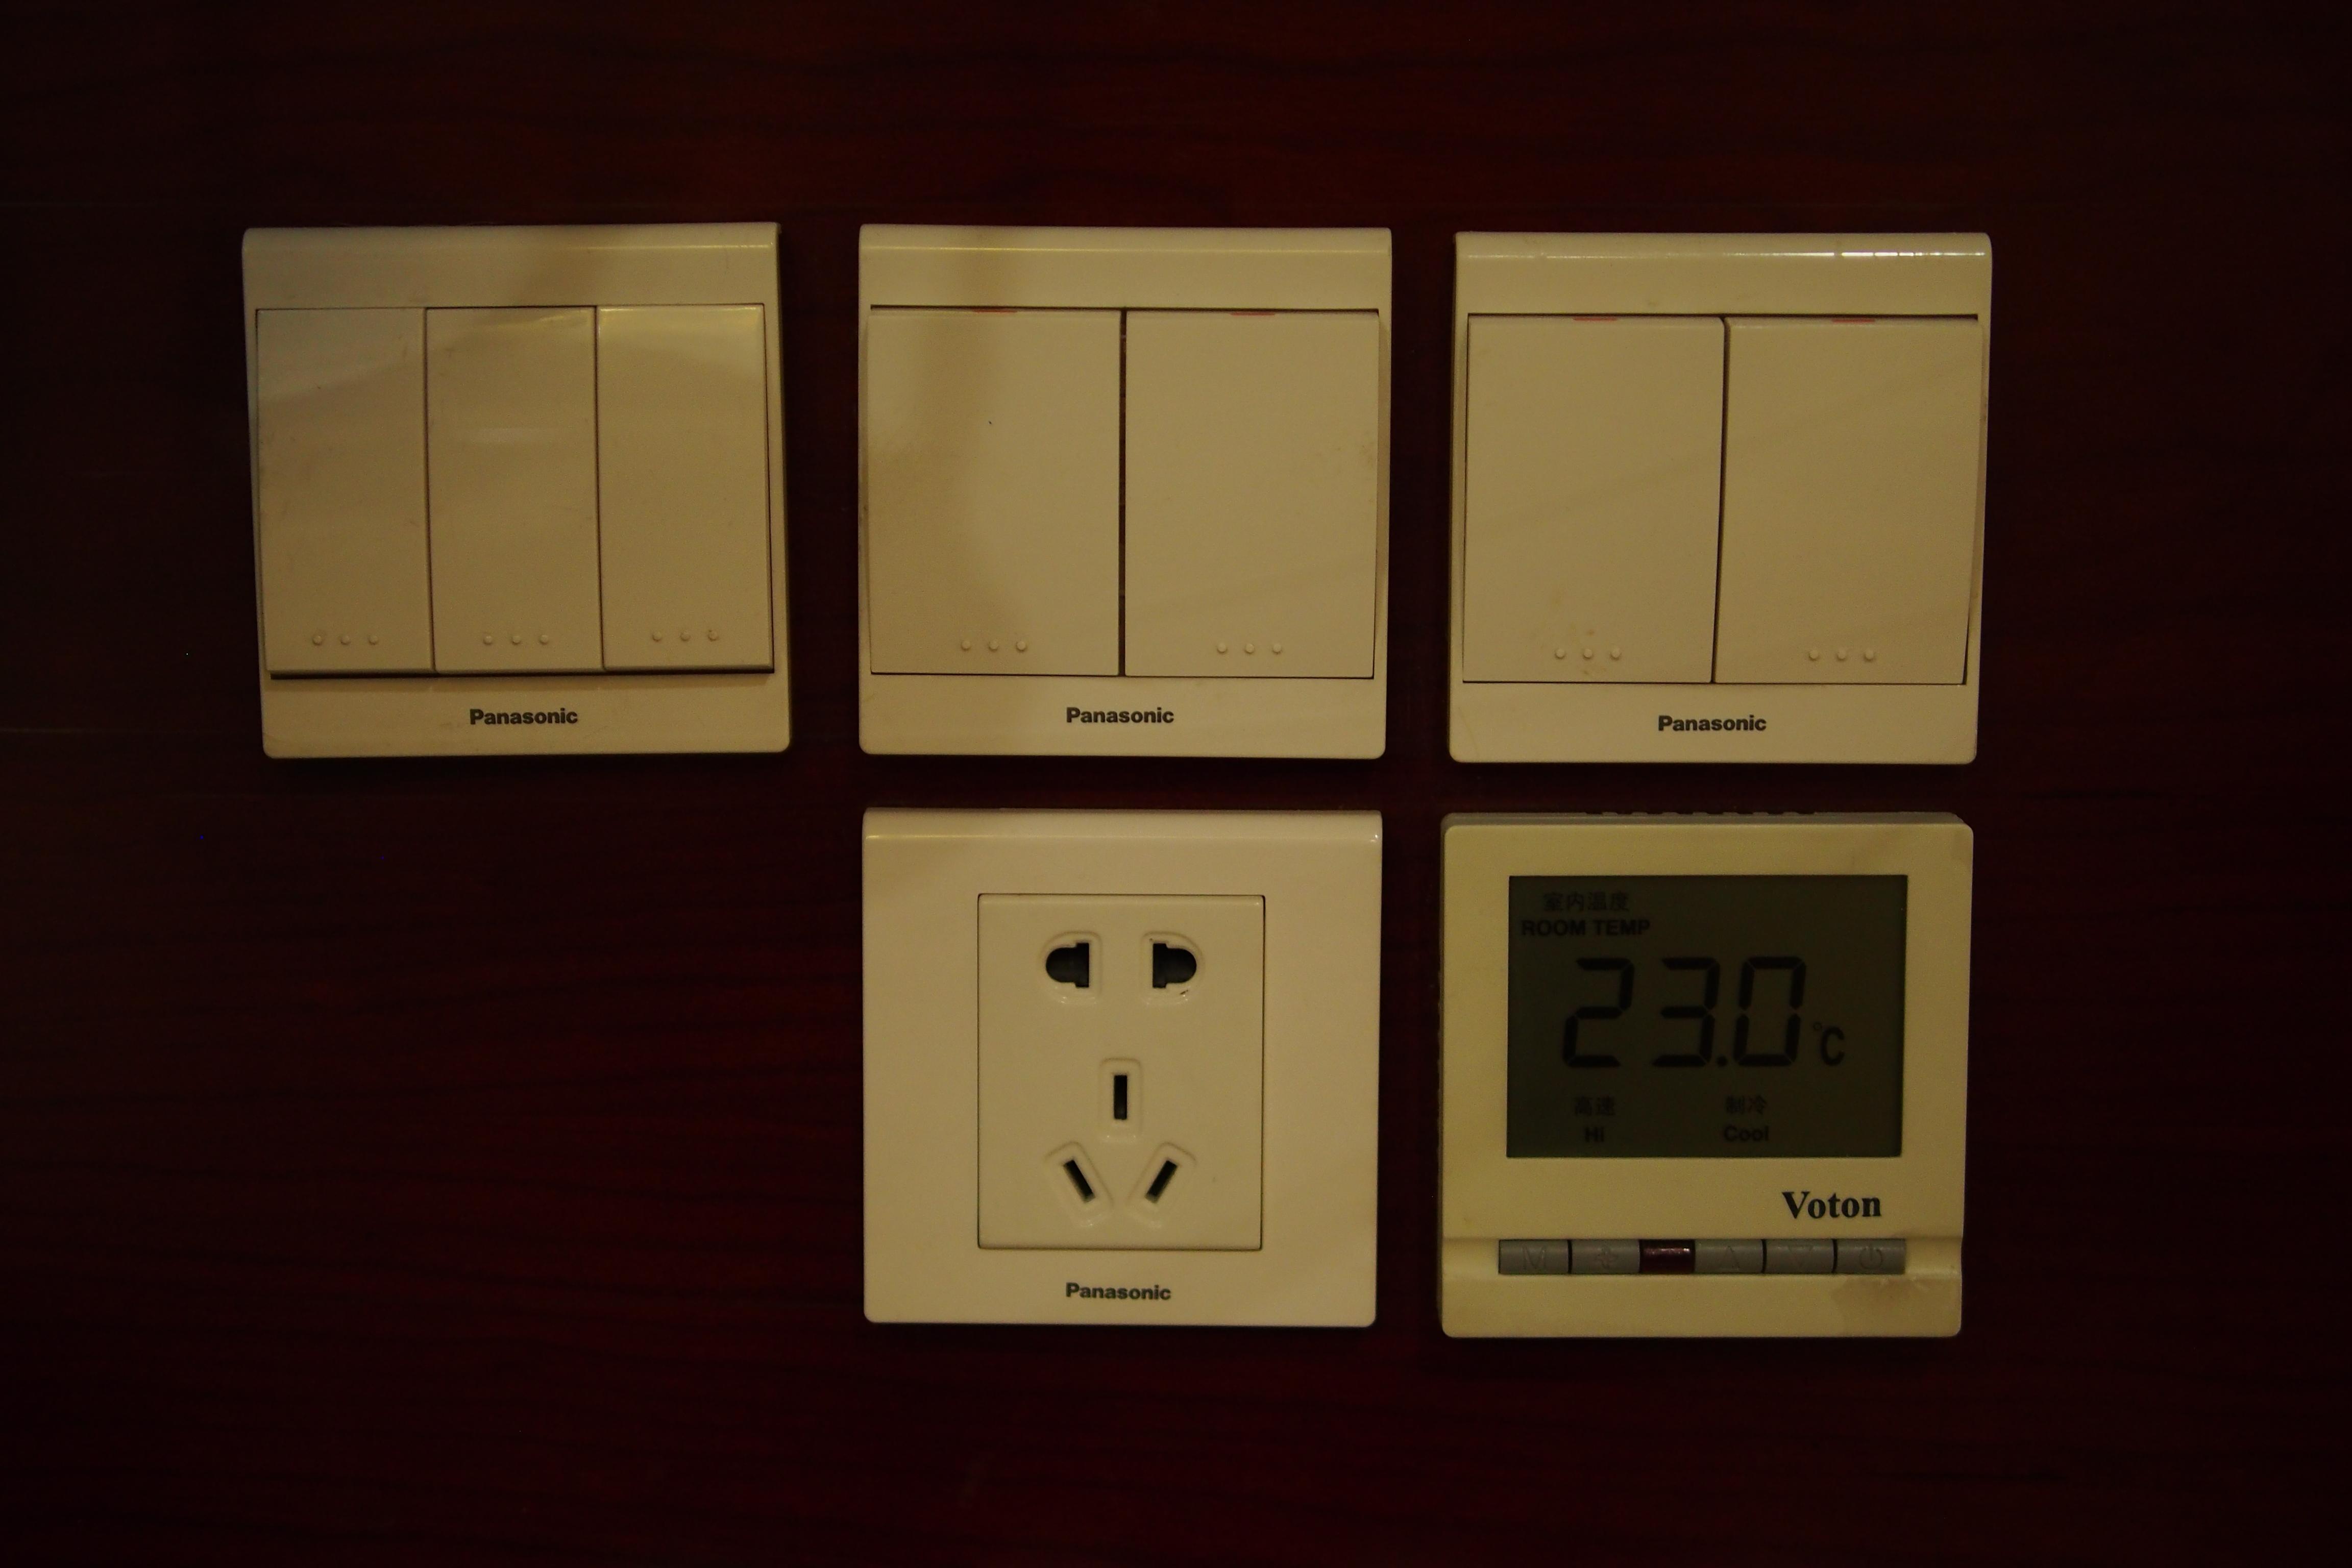 Panasonic 的電掣